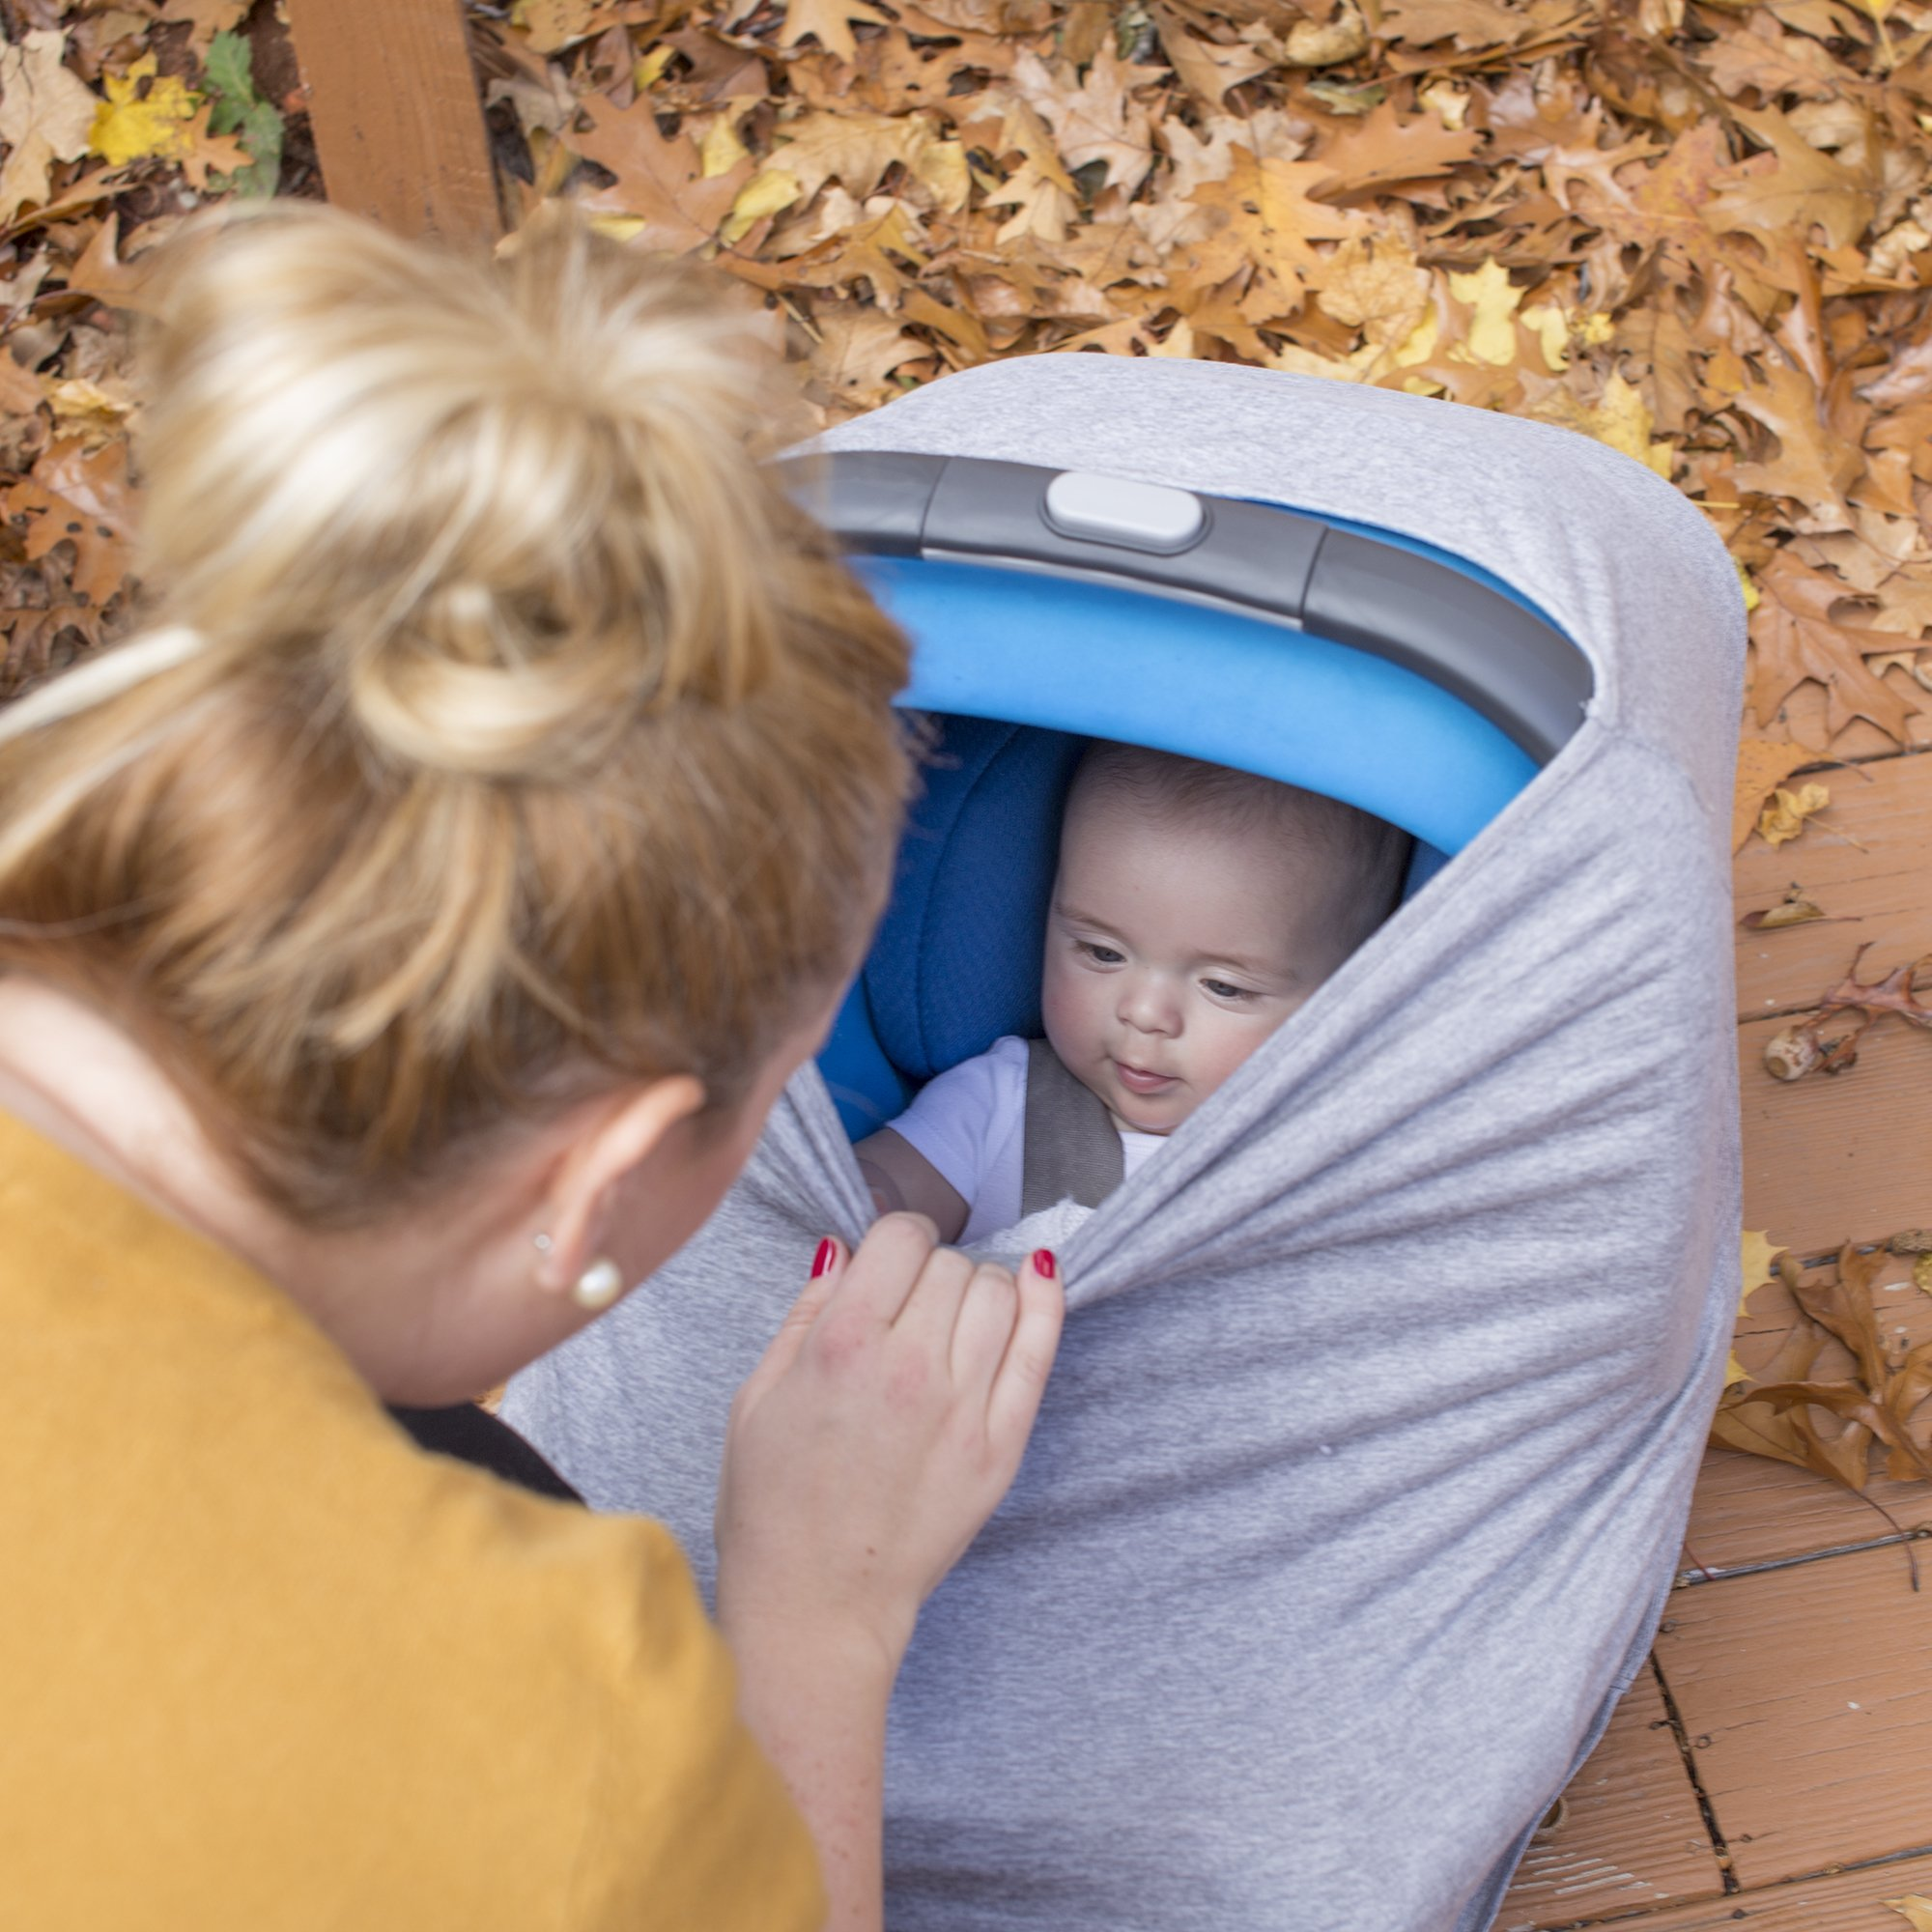 Nüroo Multi-Use Baby Car Seat, Nursing and Pumping Cover: Heather Grey